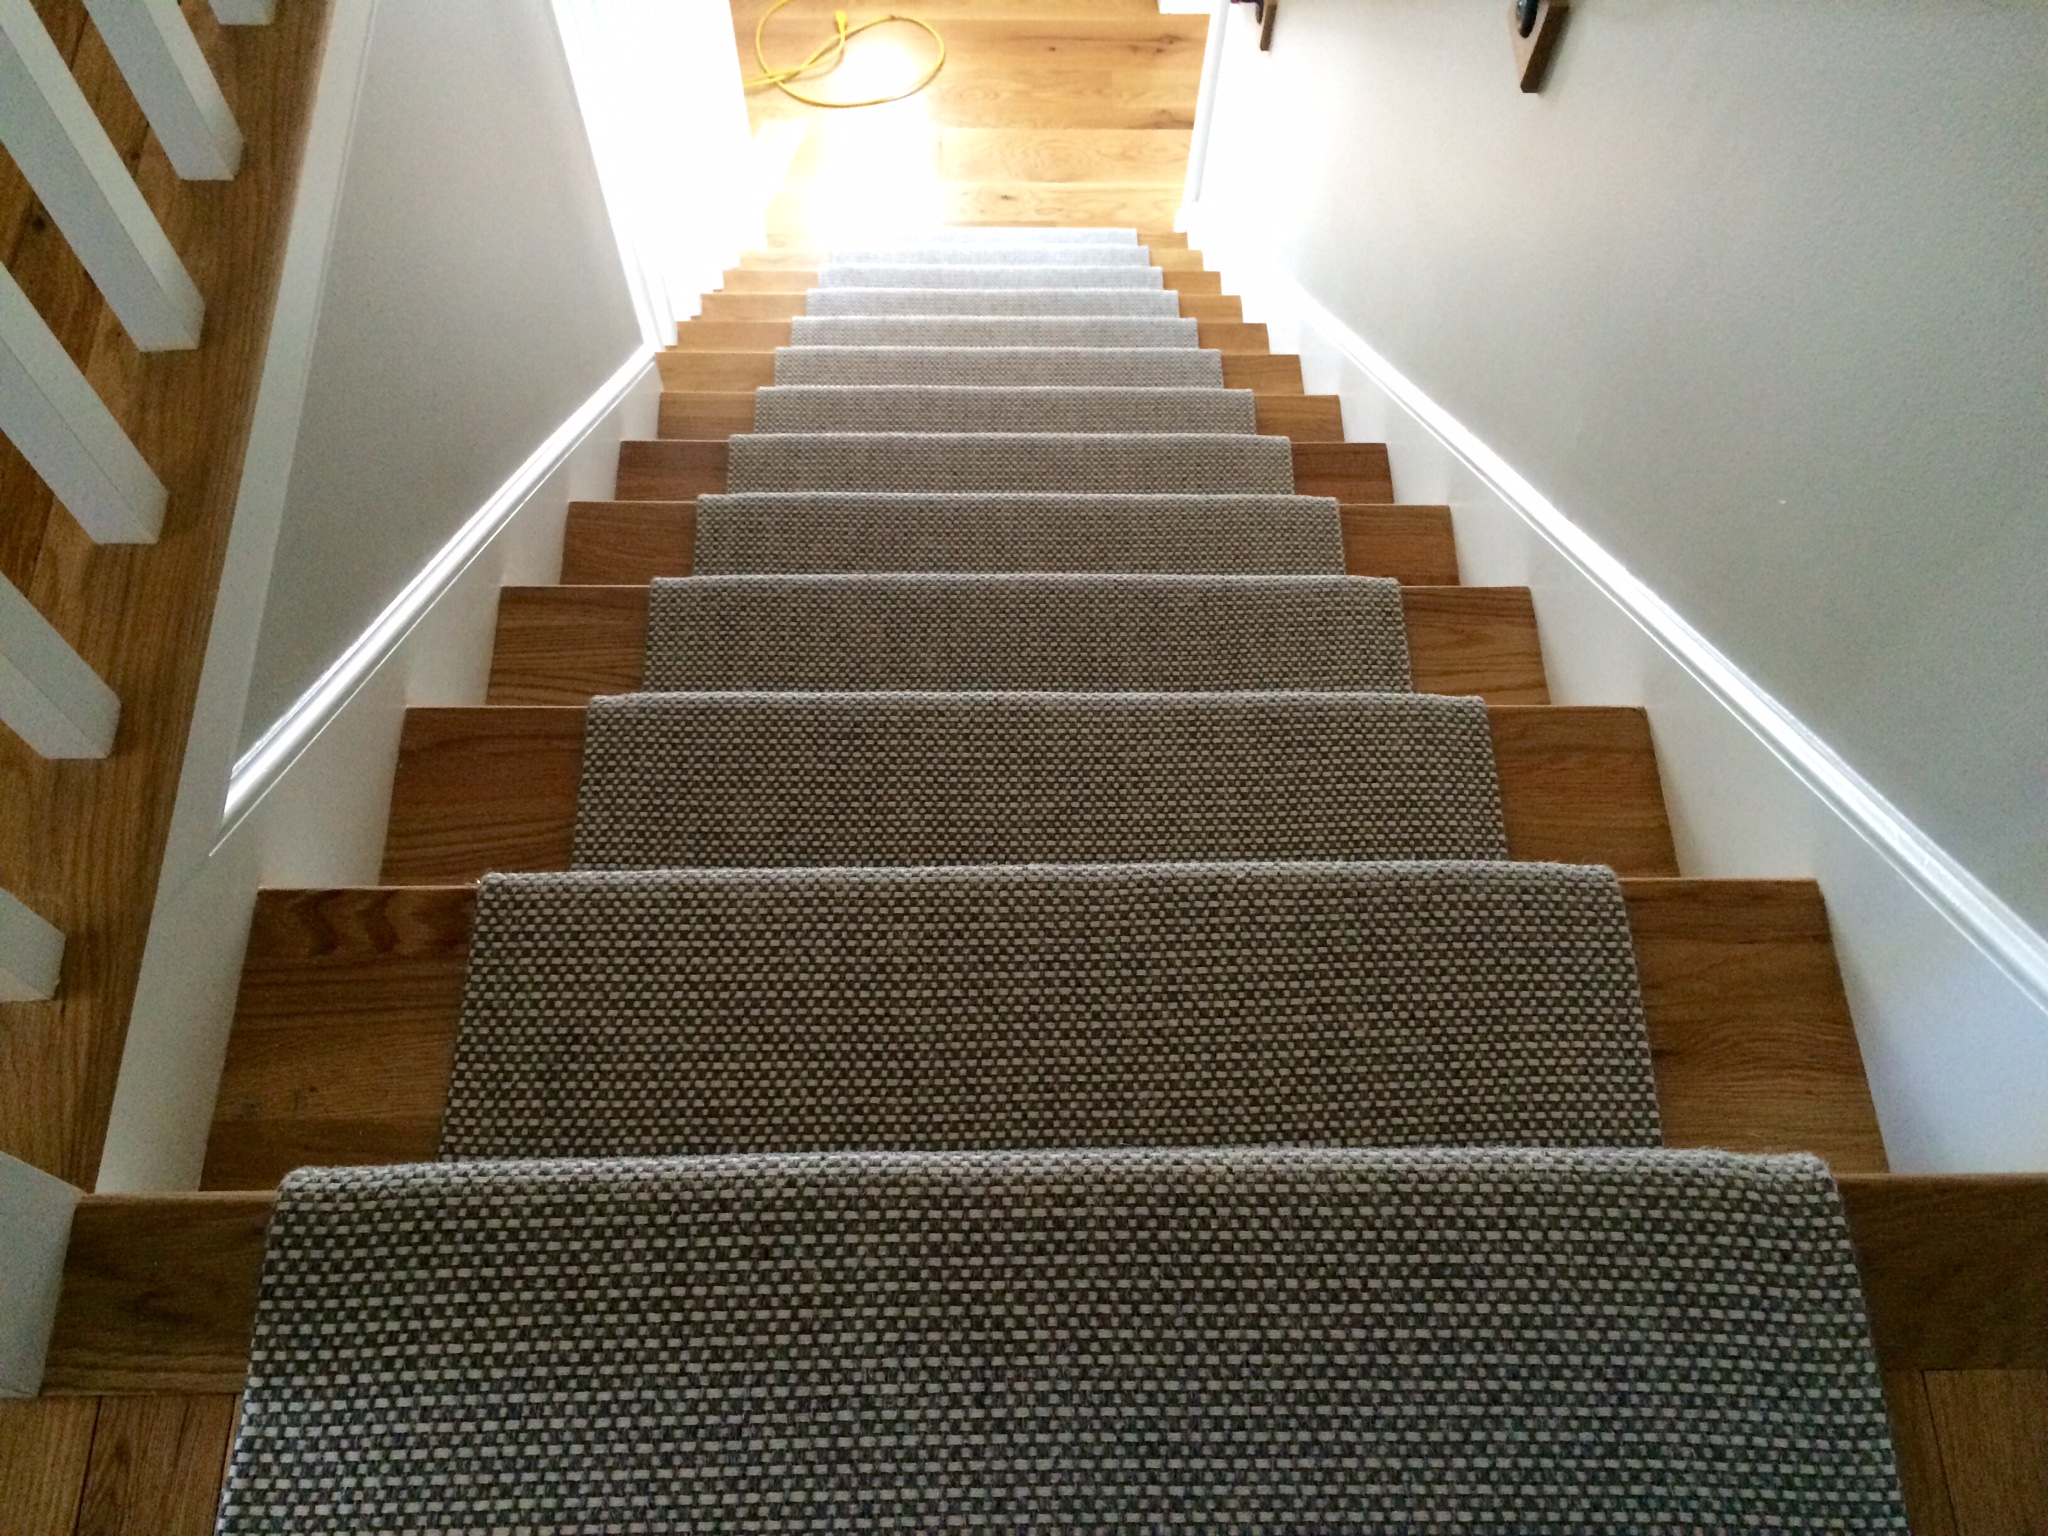 Popular IMG_0127 IMG_0129 wool carpet stair runners